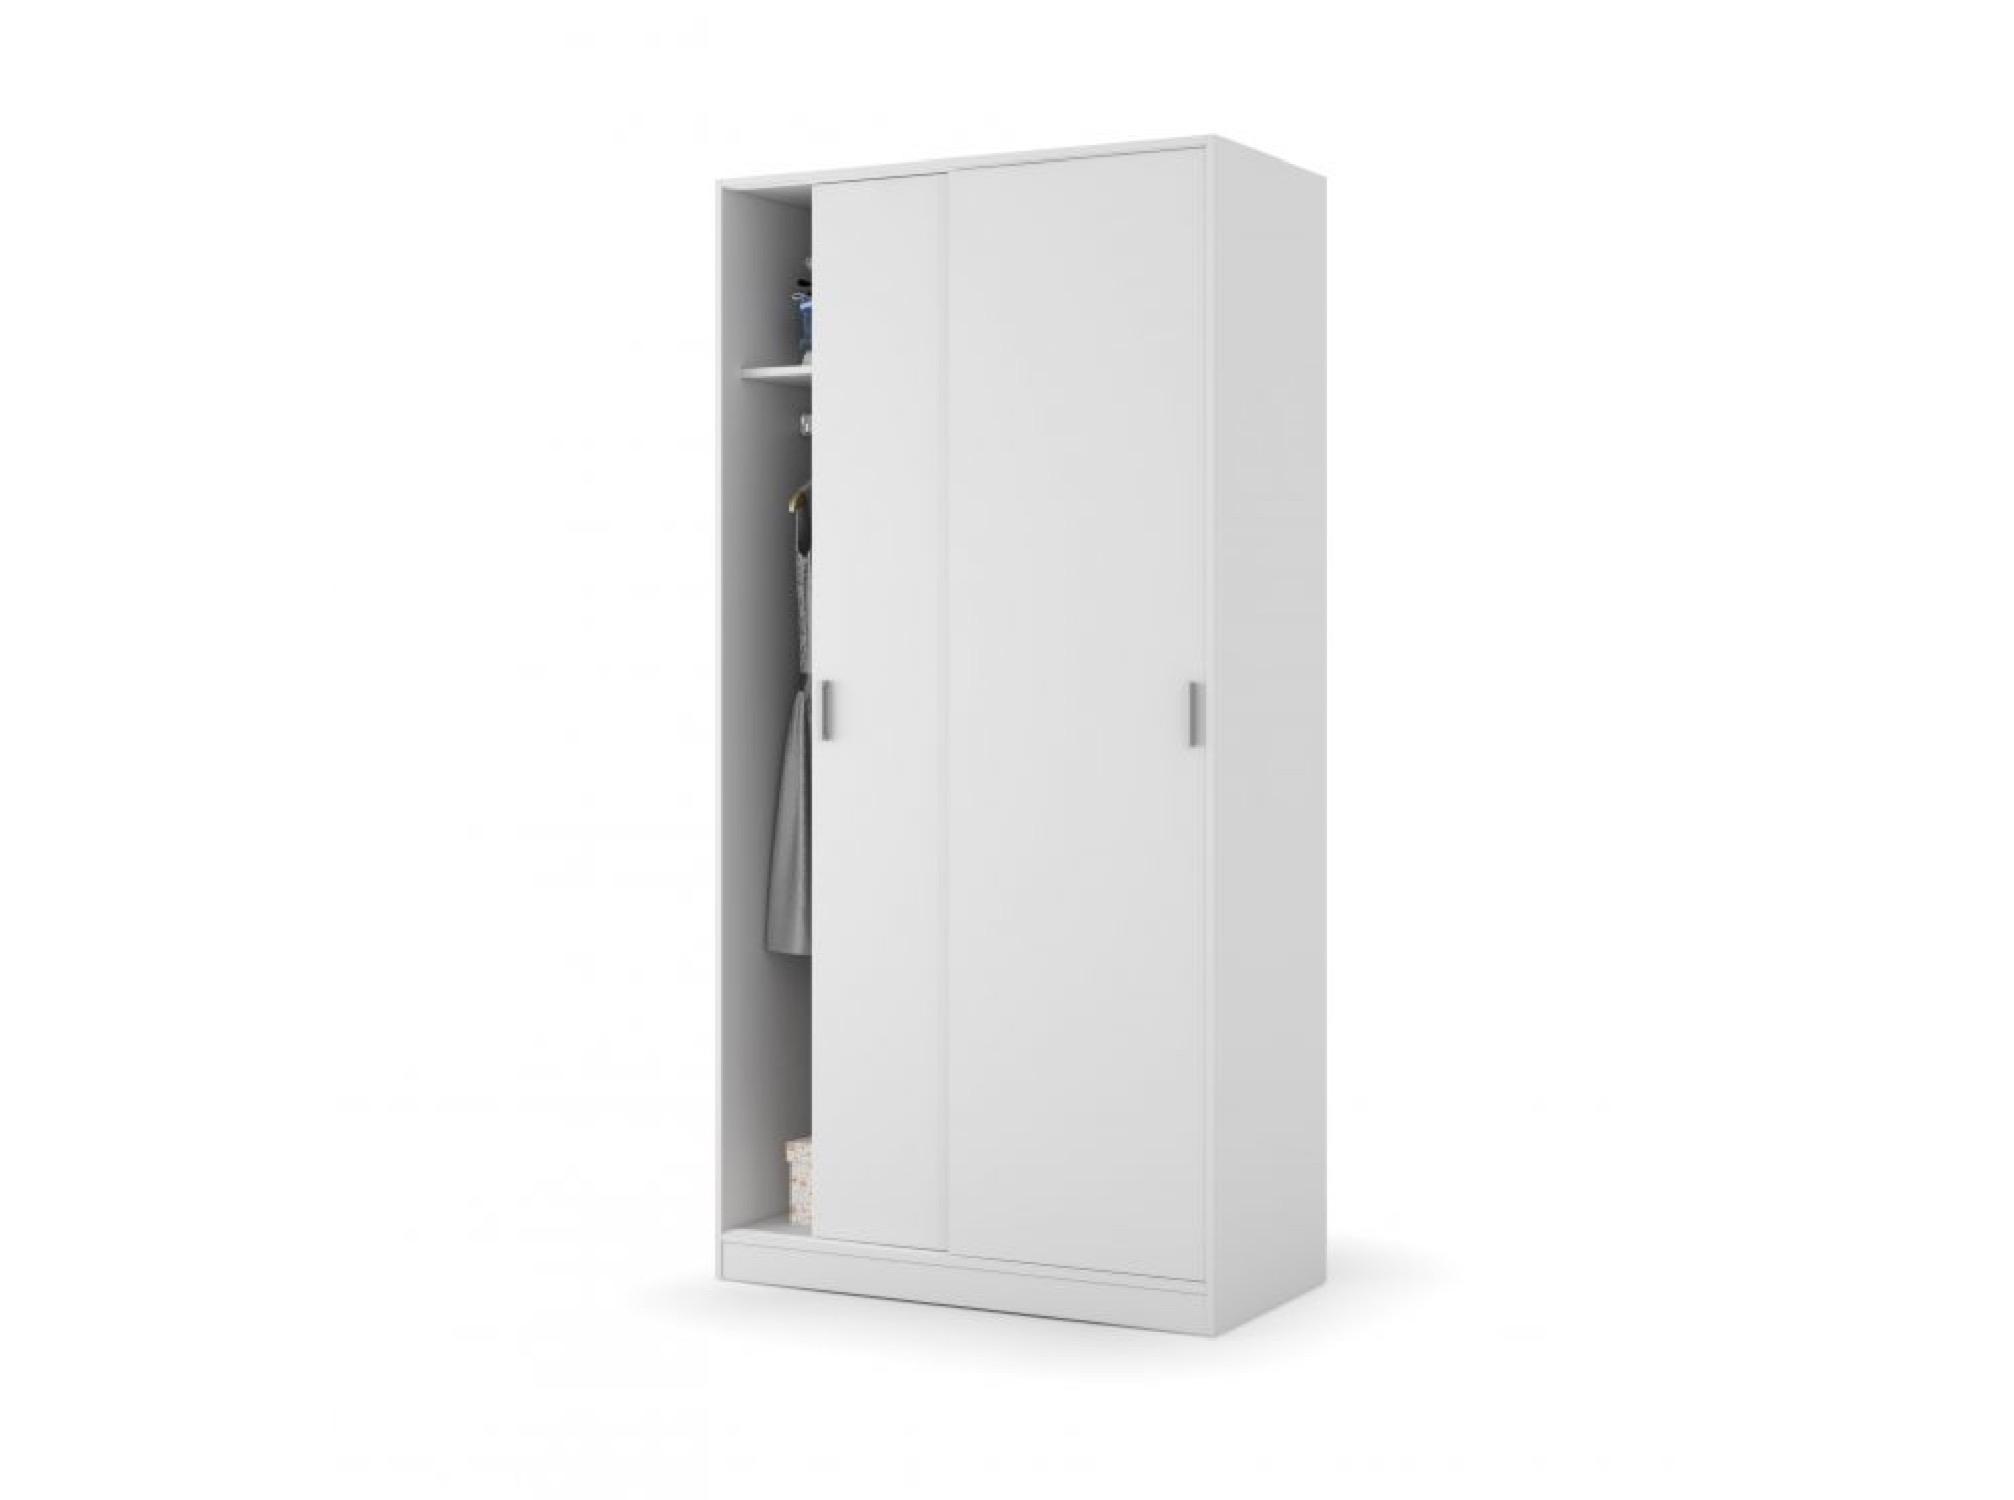 Armoire blanche 2 portes coulissantes 100x200 (photo)